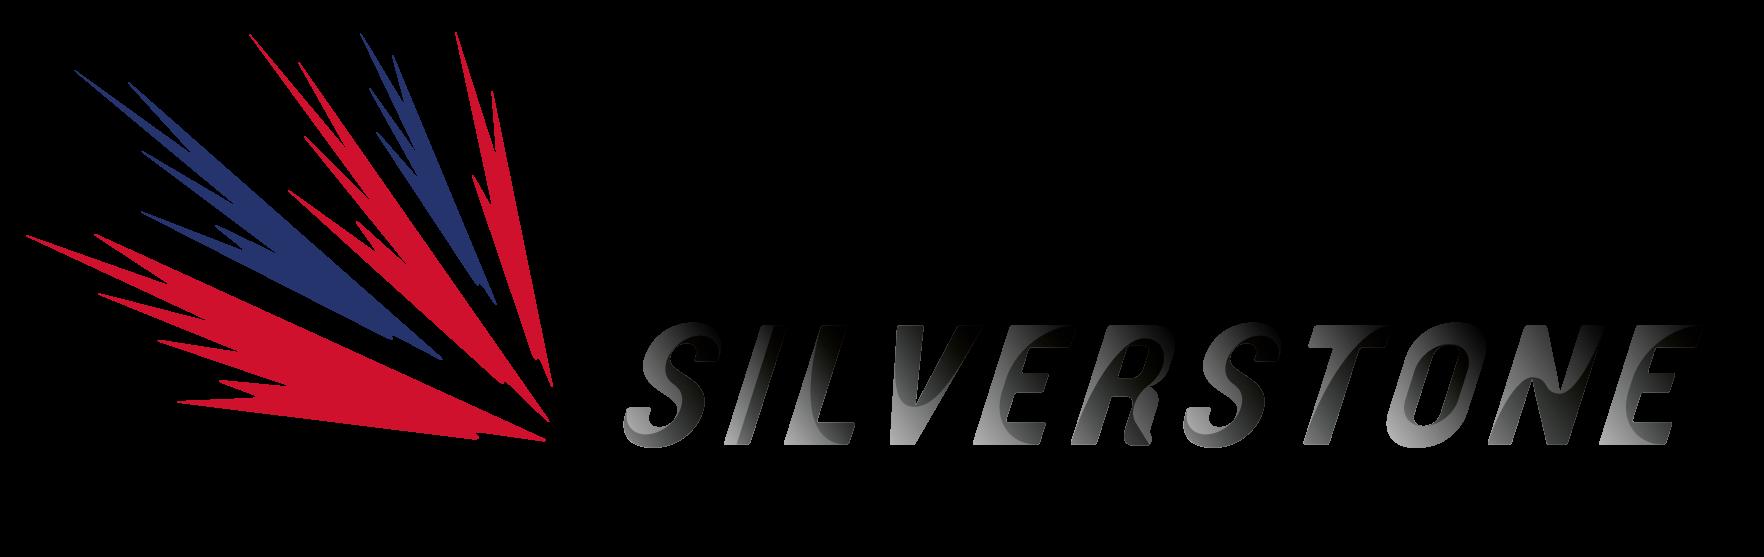 silverstone-logo.png